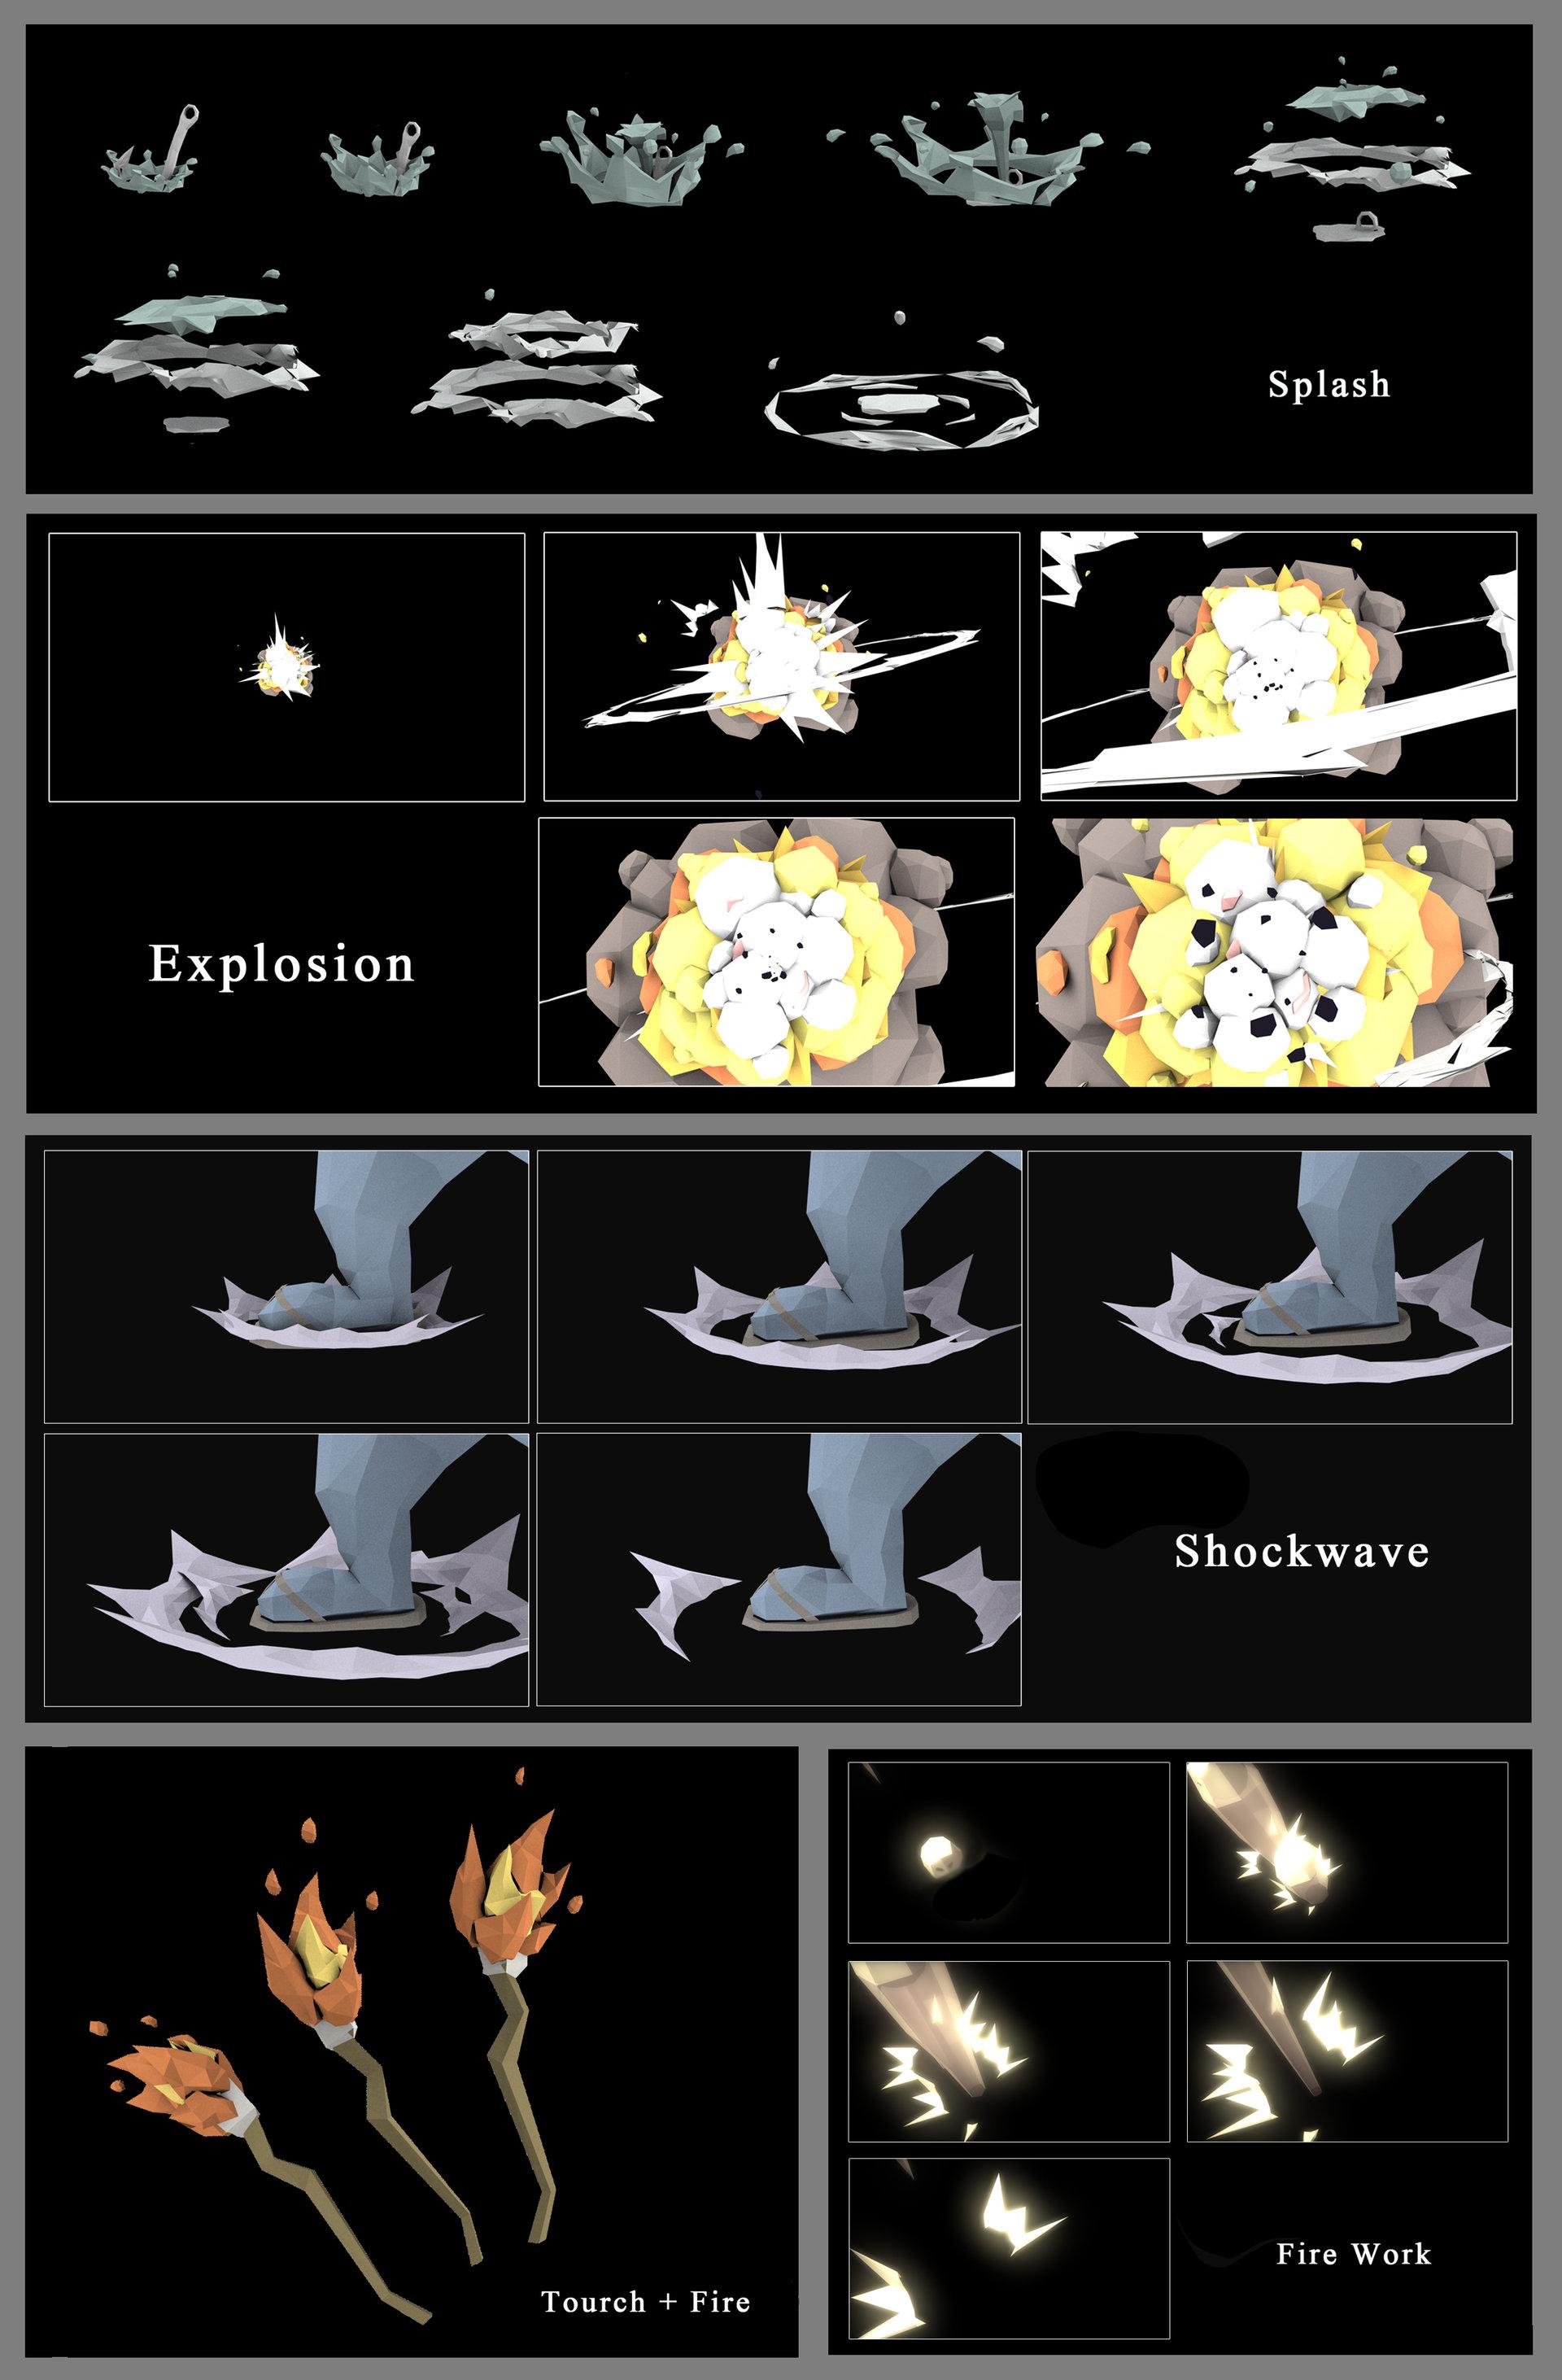 Leo ogawa lillrank effects